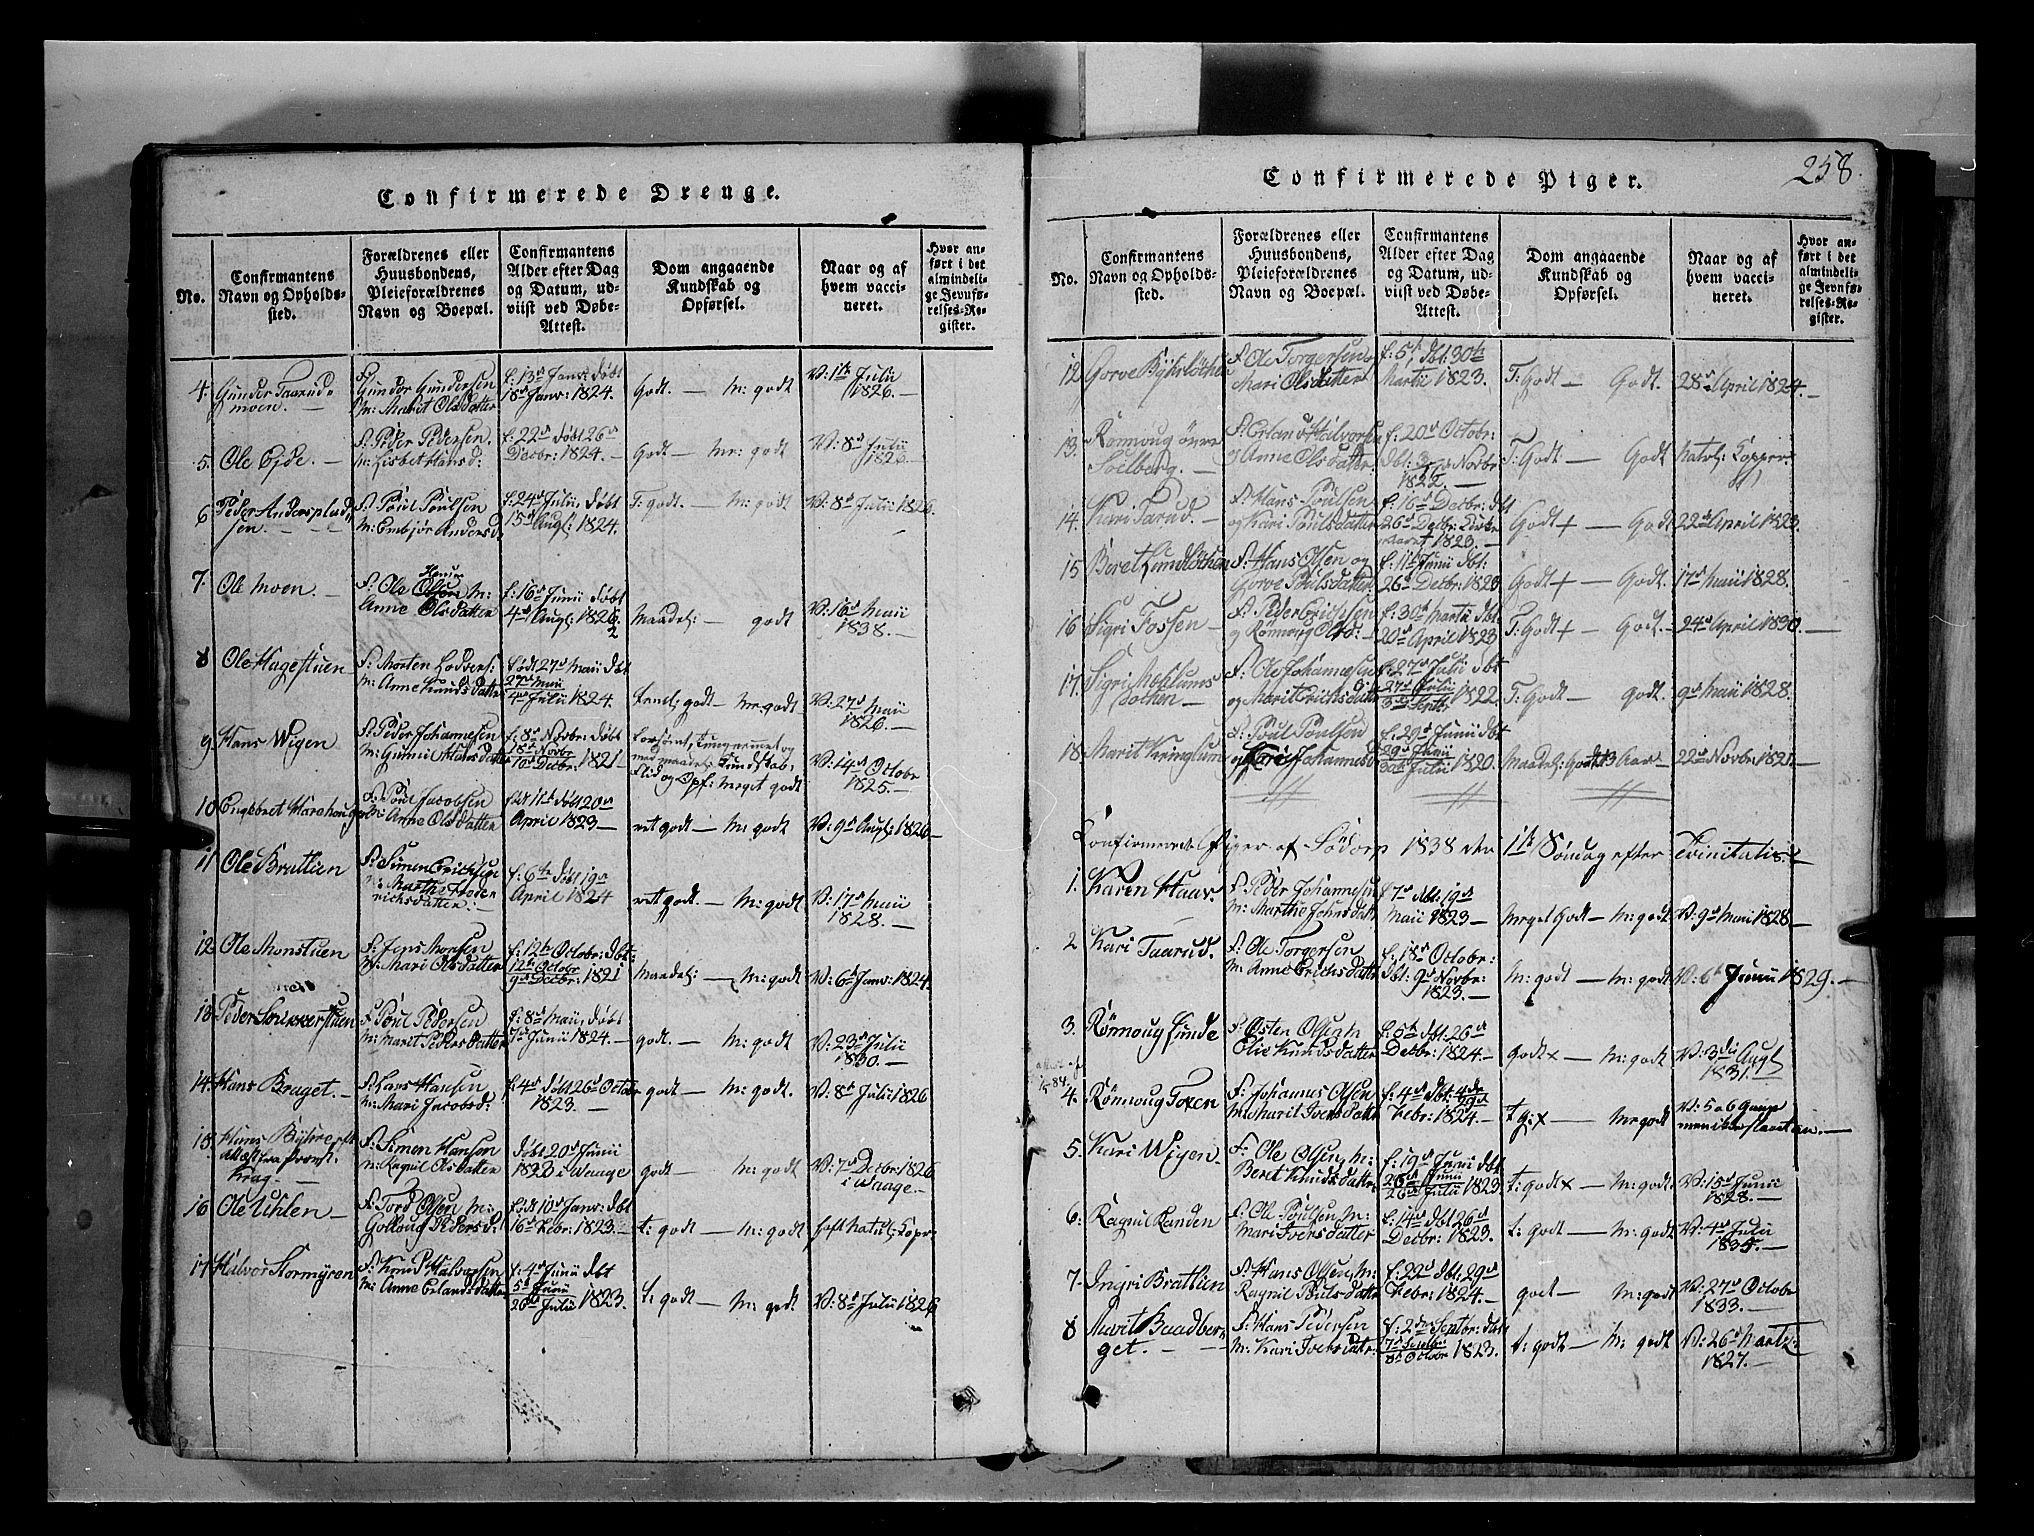 SAH, Fron prestekontor, H/Ha/Hab/L0004: Klokkerbok nr. 4, 1816-1850, s. 258